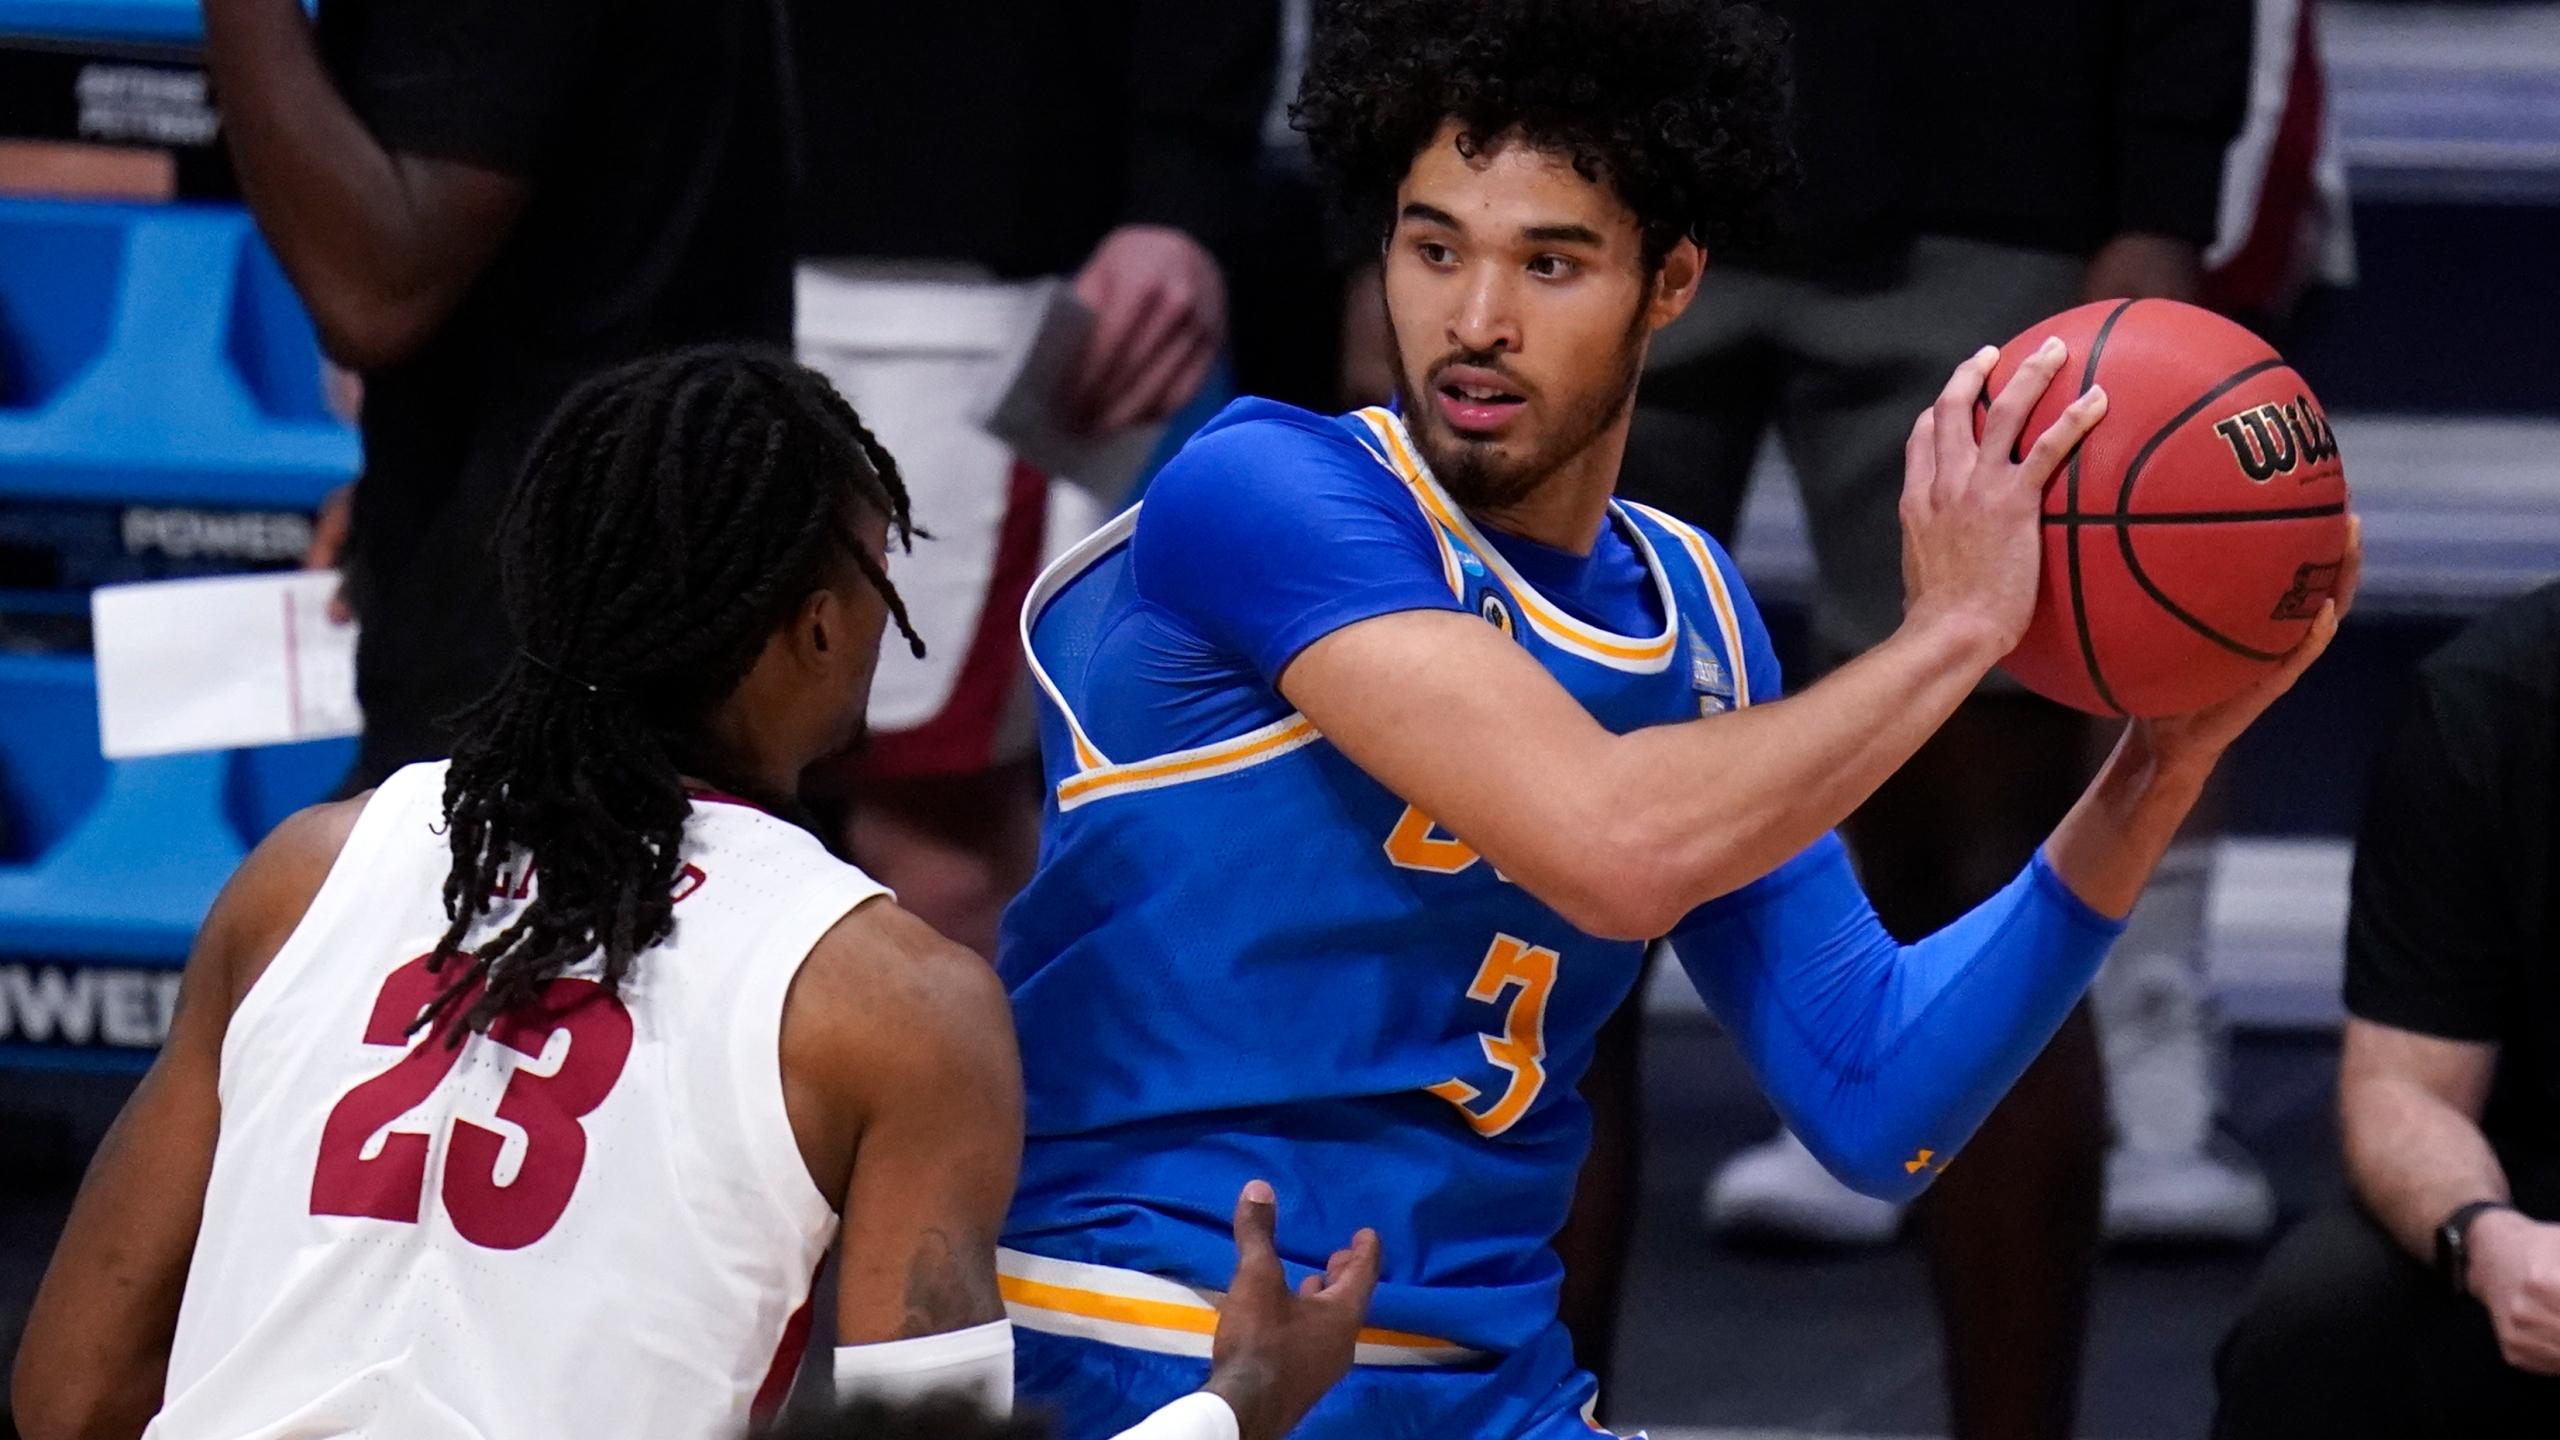 UCLA guard Johnny Juzang (3) protects the ball from Alabama guard John Petty Jr. (AP Photo/Michael Conroy)